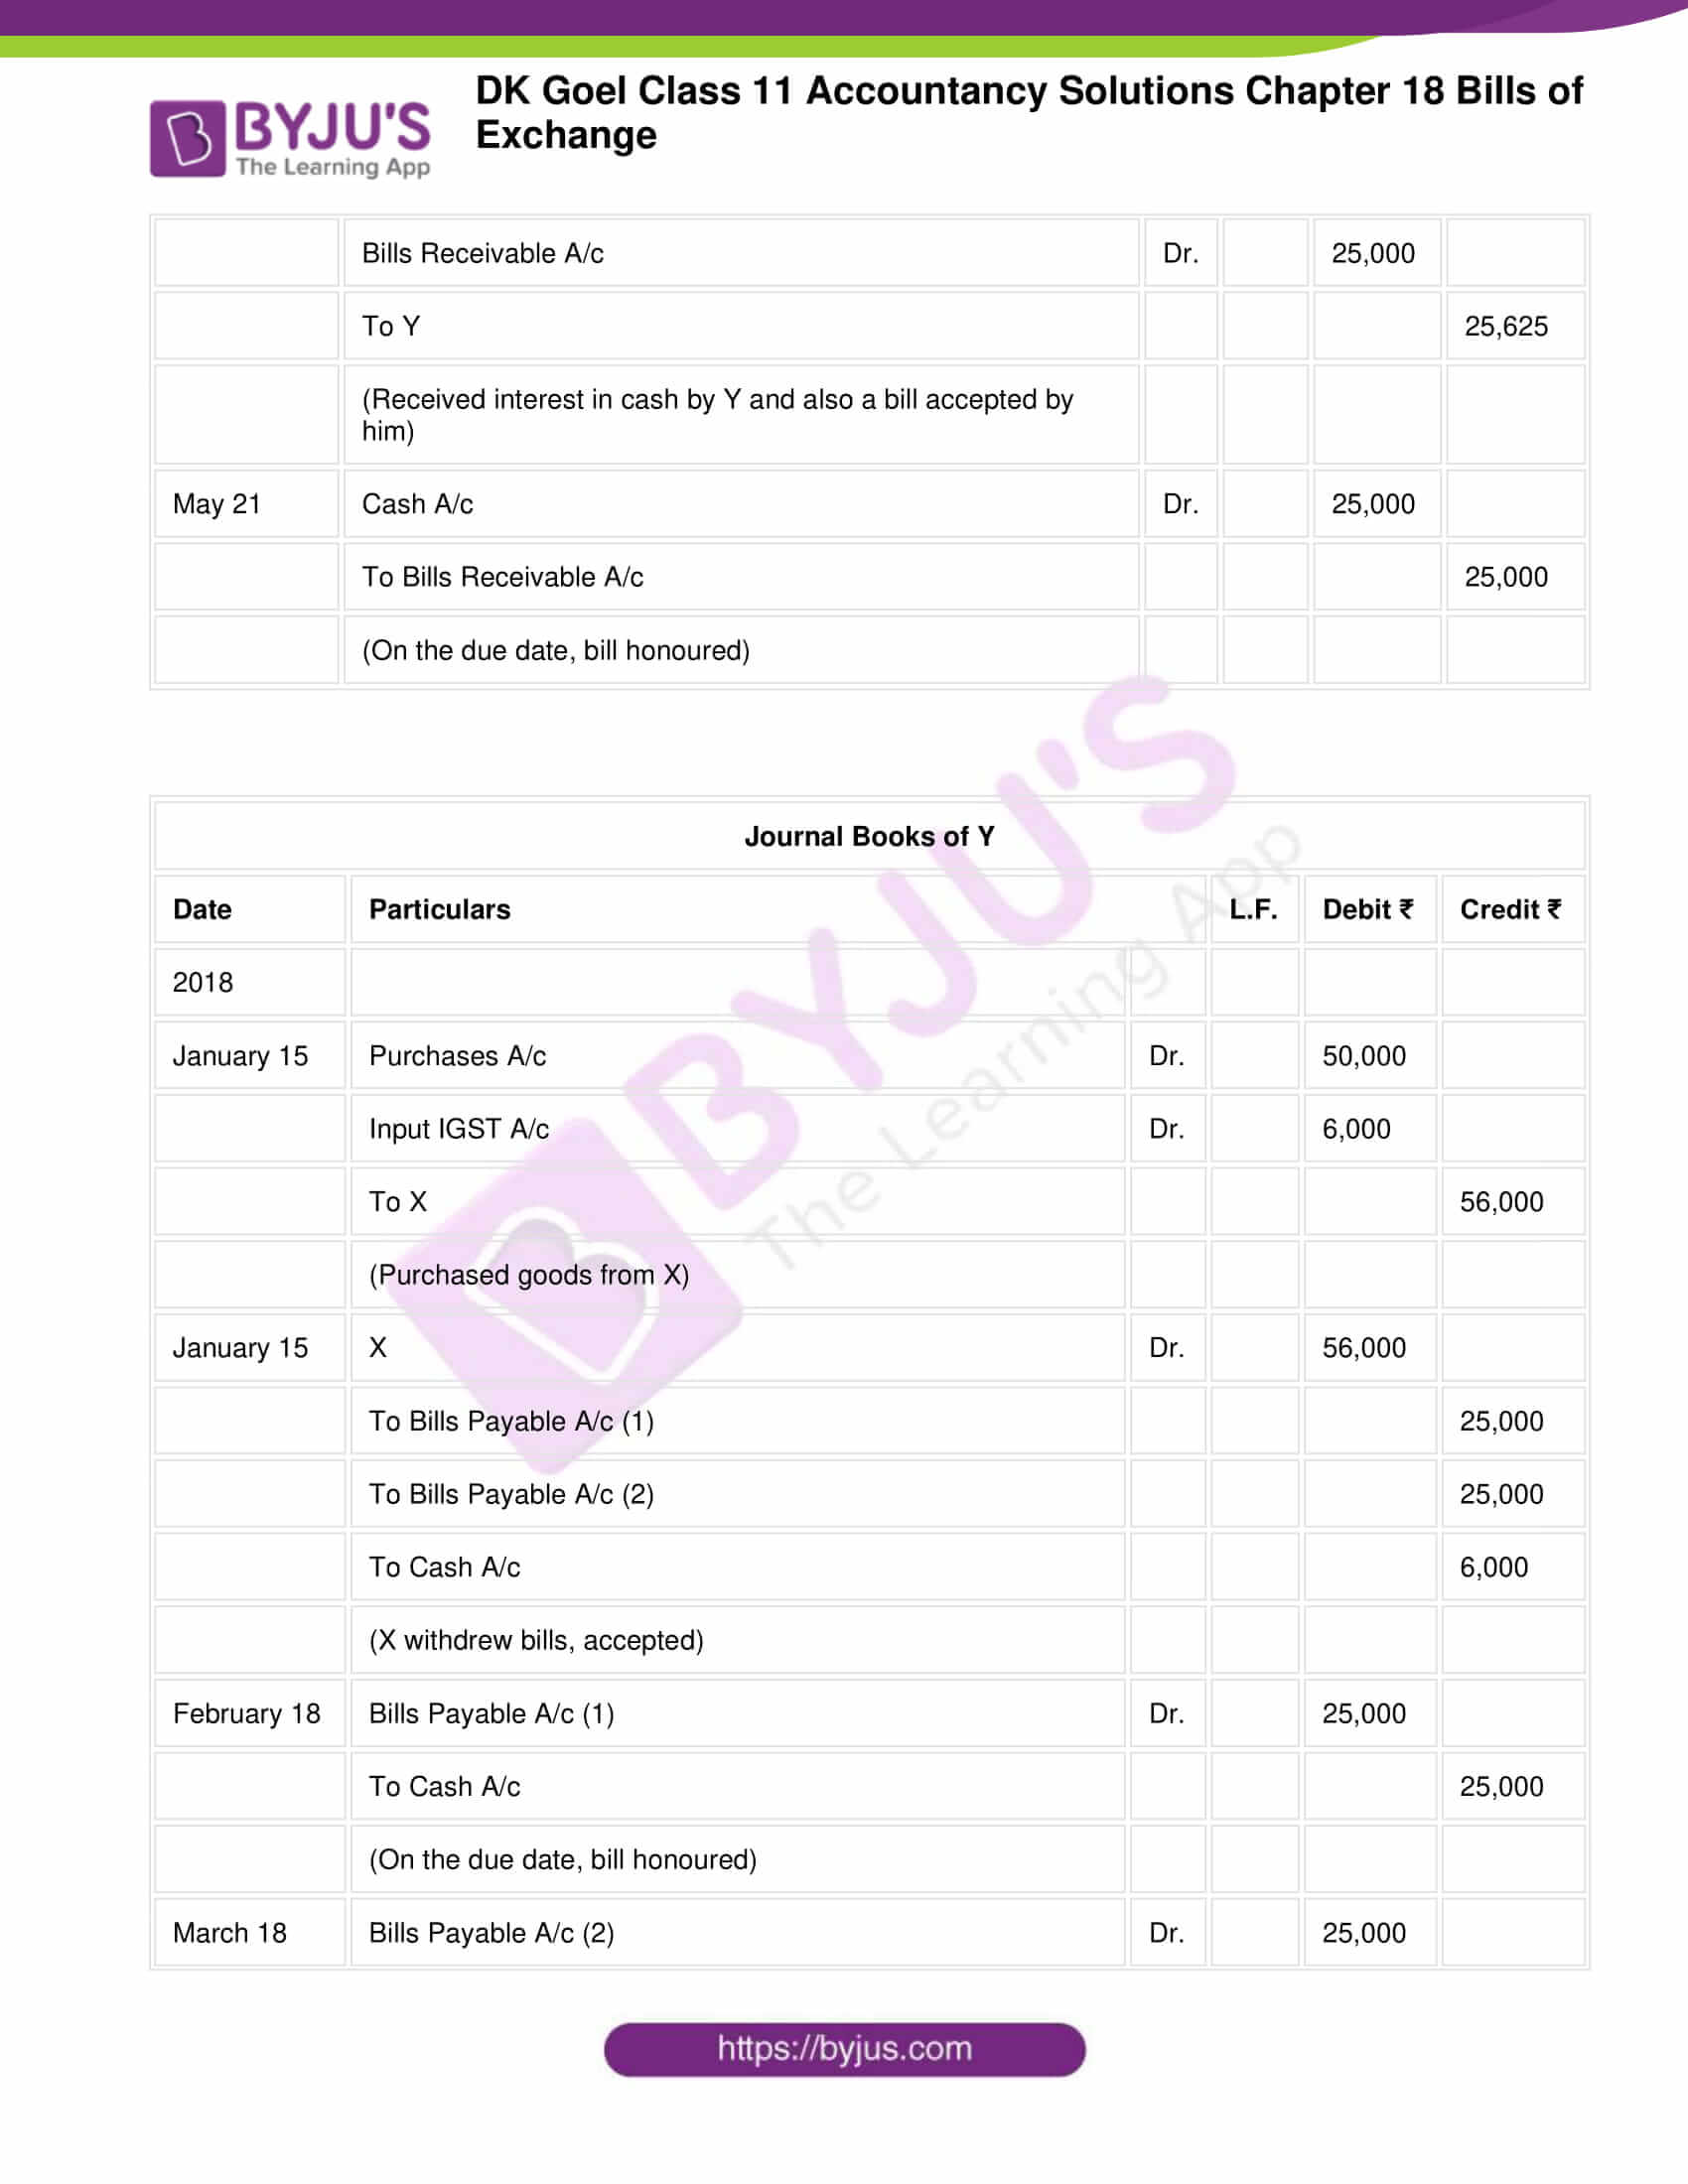 dk goel class 11 accountancy solutions chapter 18 101